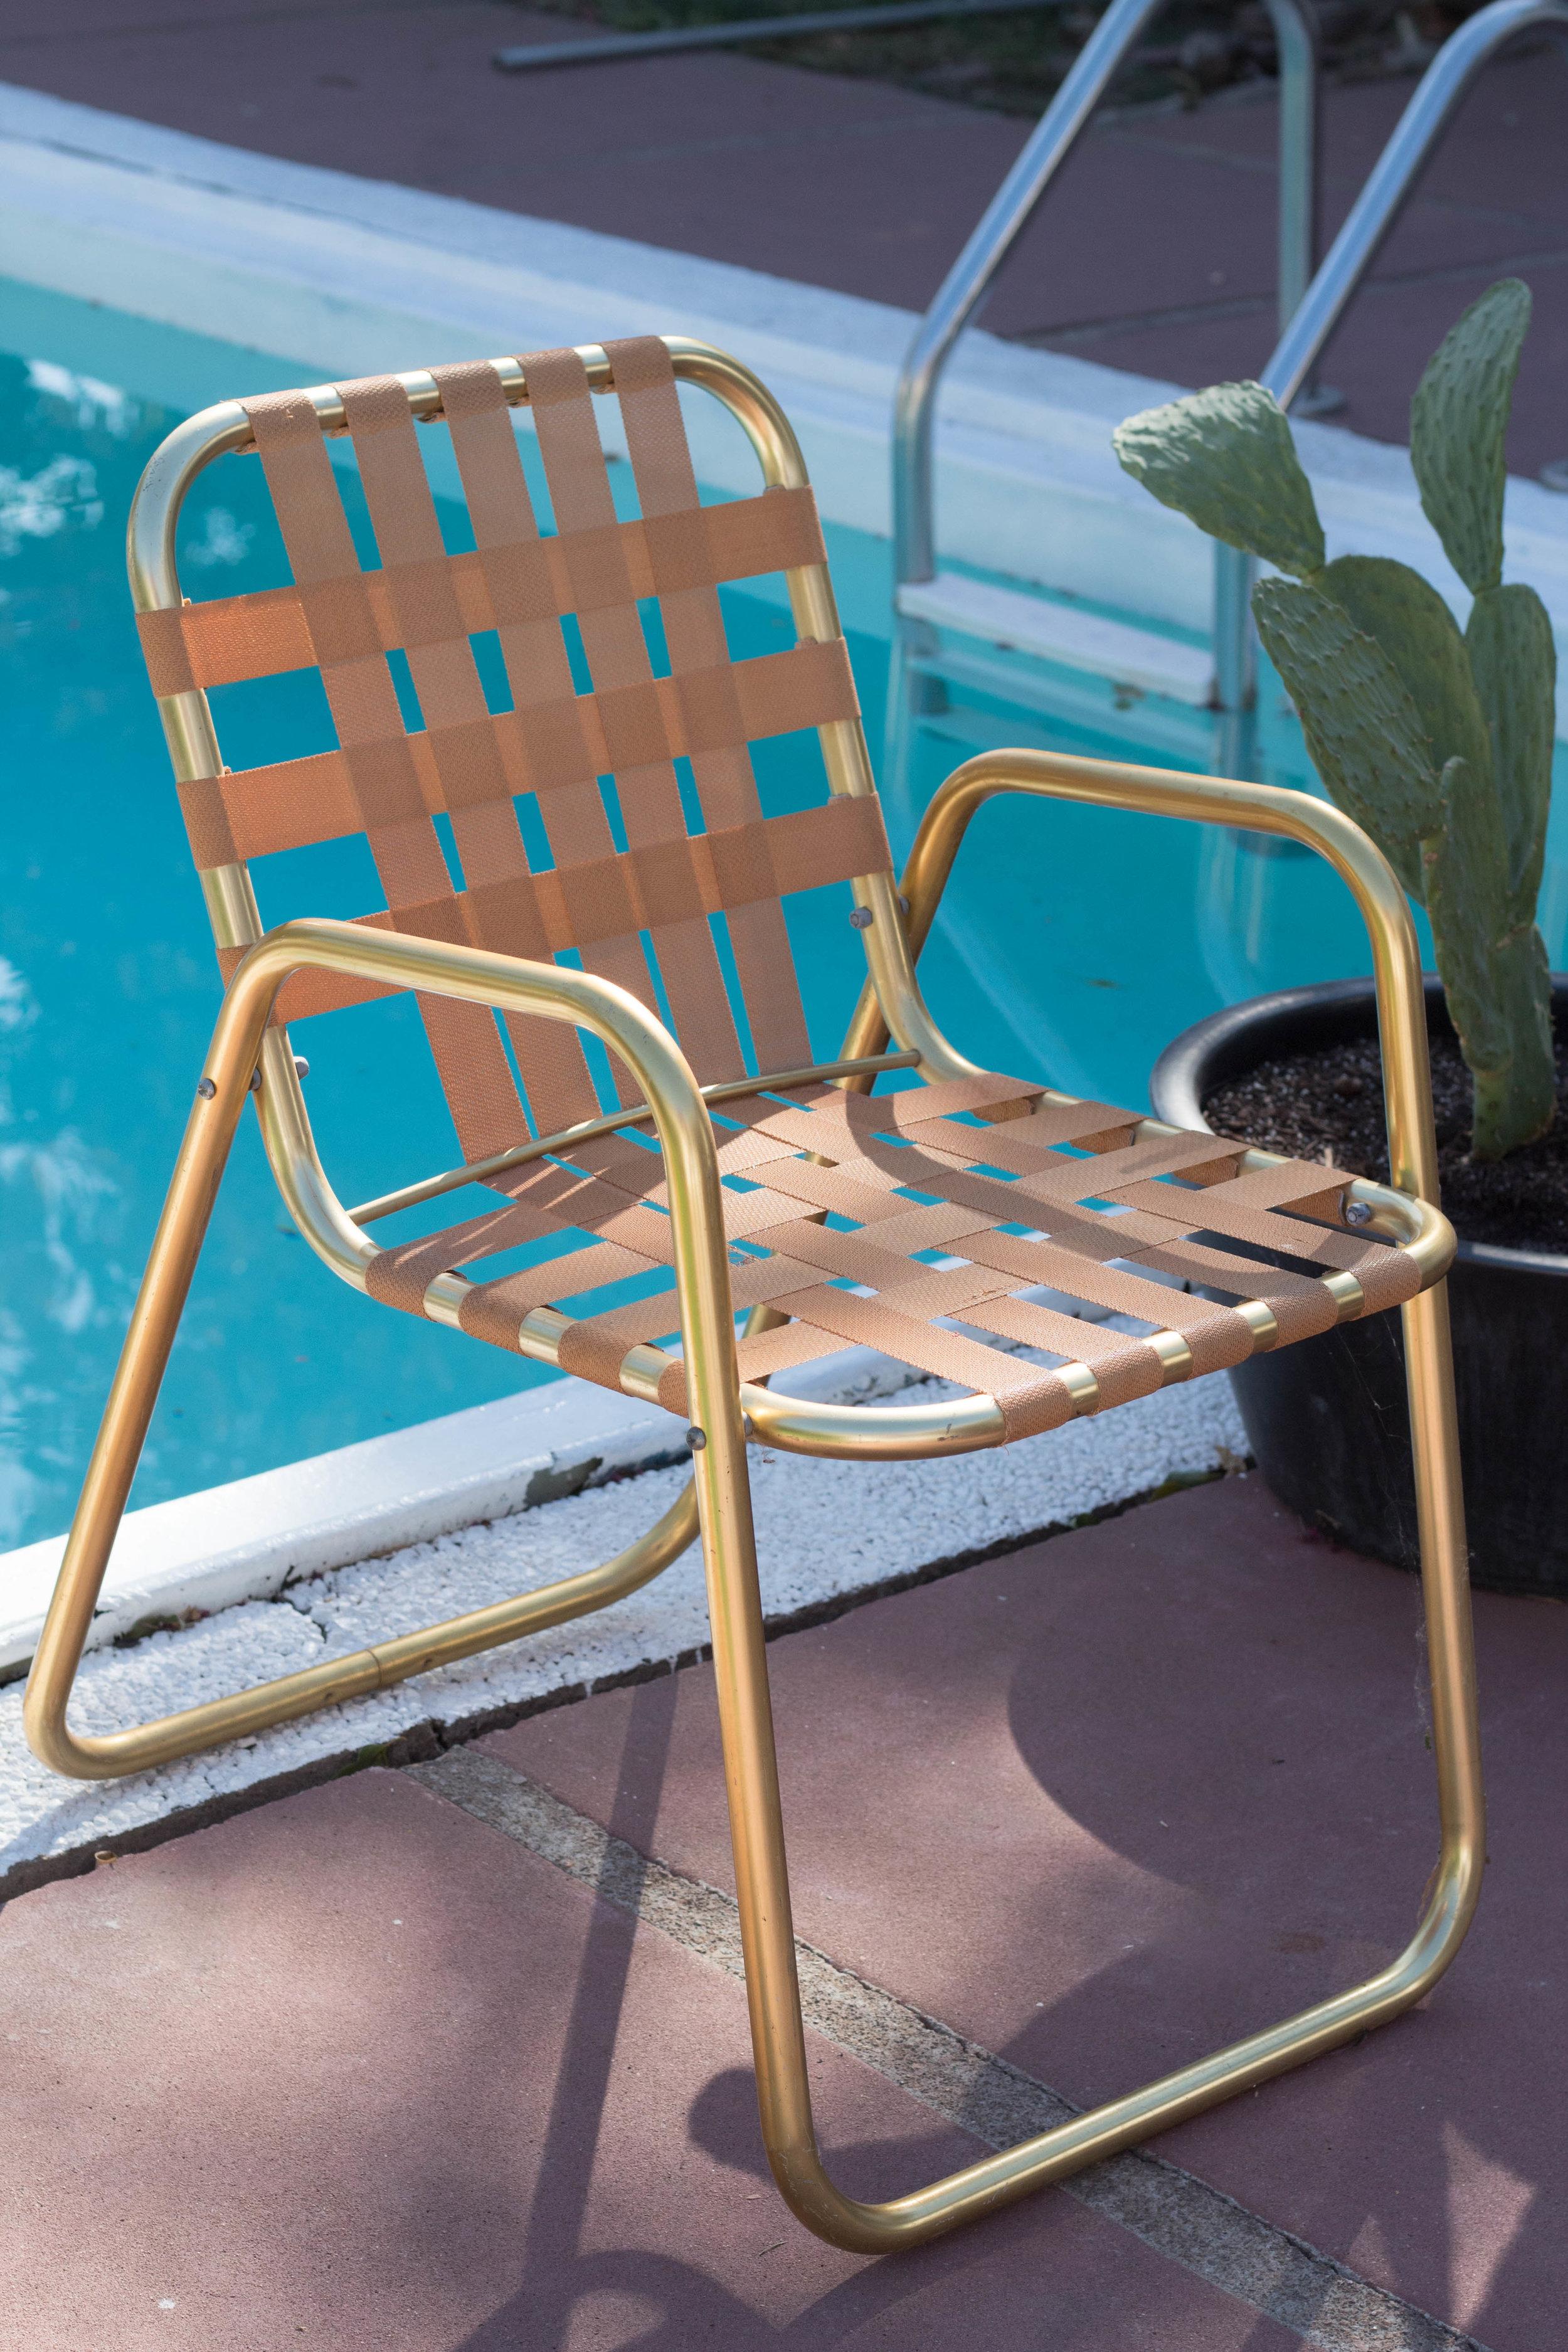 Bon and Jovi - (2) Lattice strap chairs